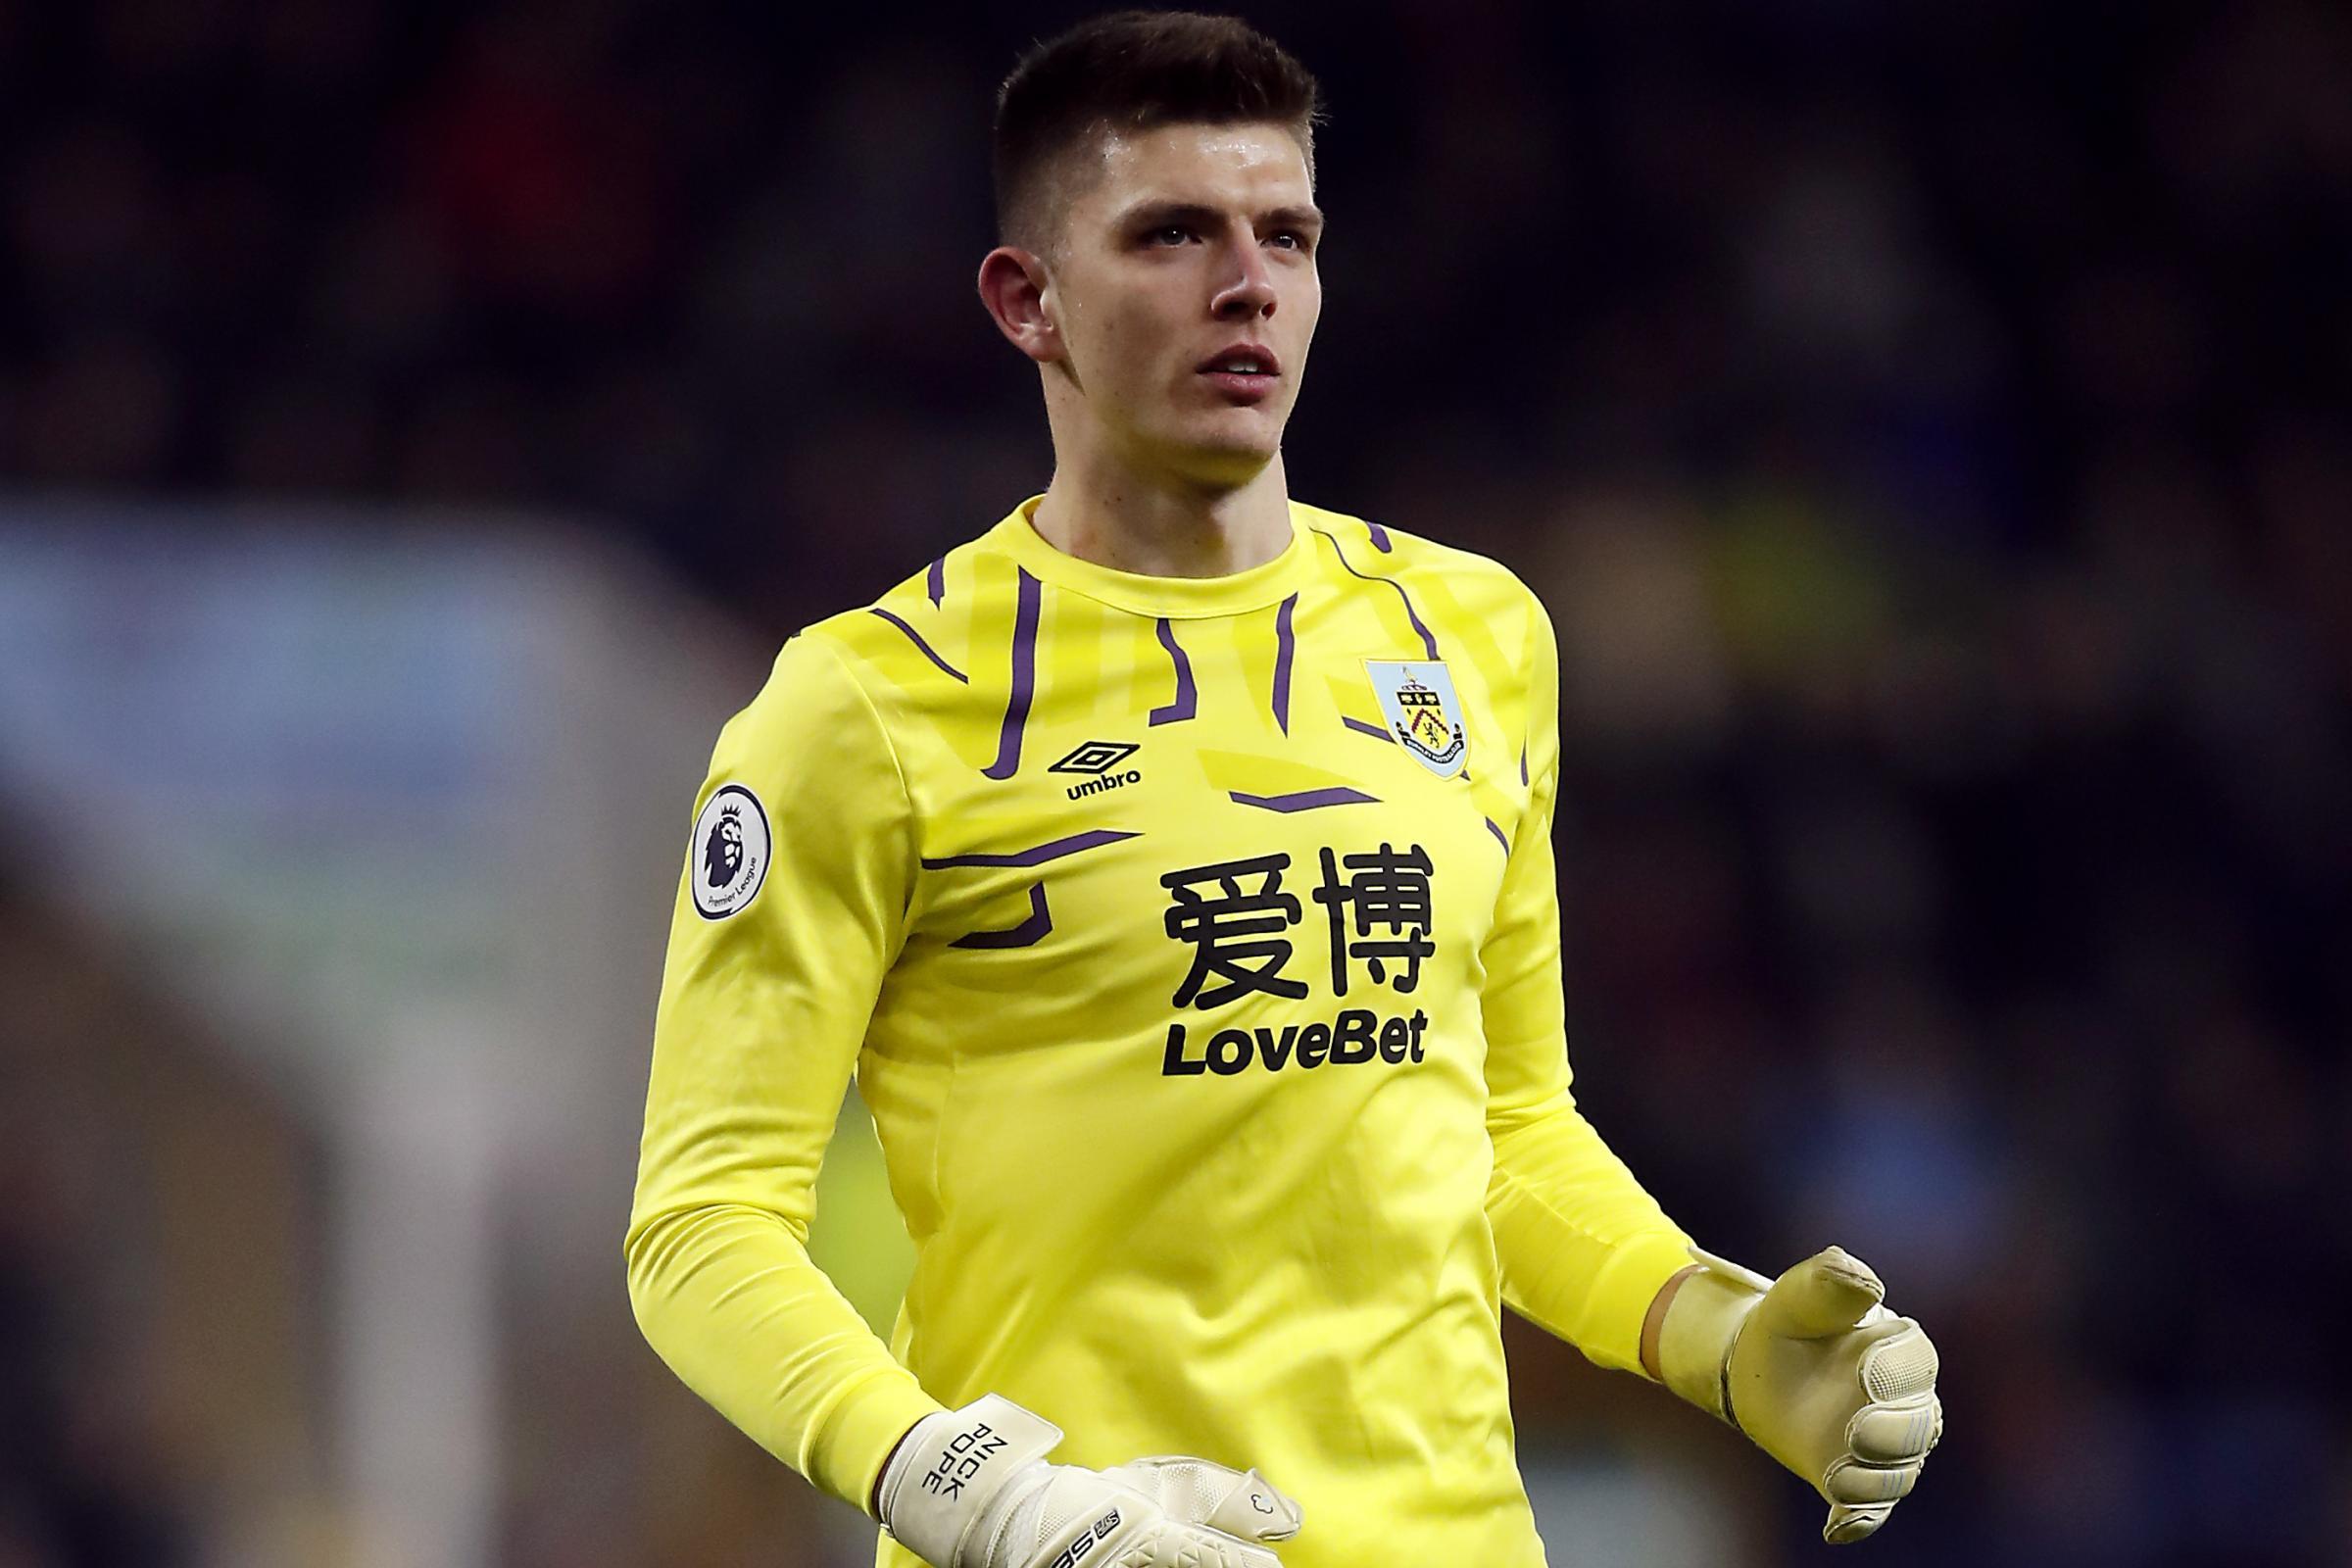 Burnley goalkeeper Pope named in PFA Premier League team of the year